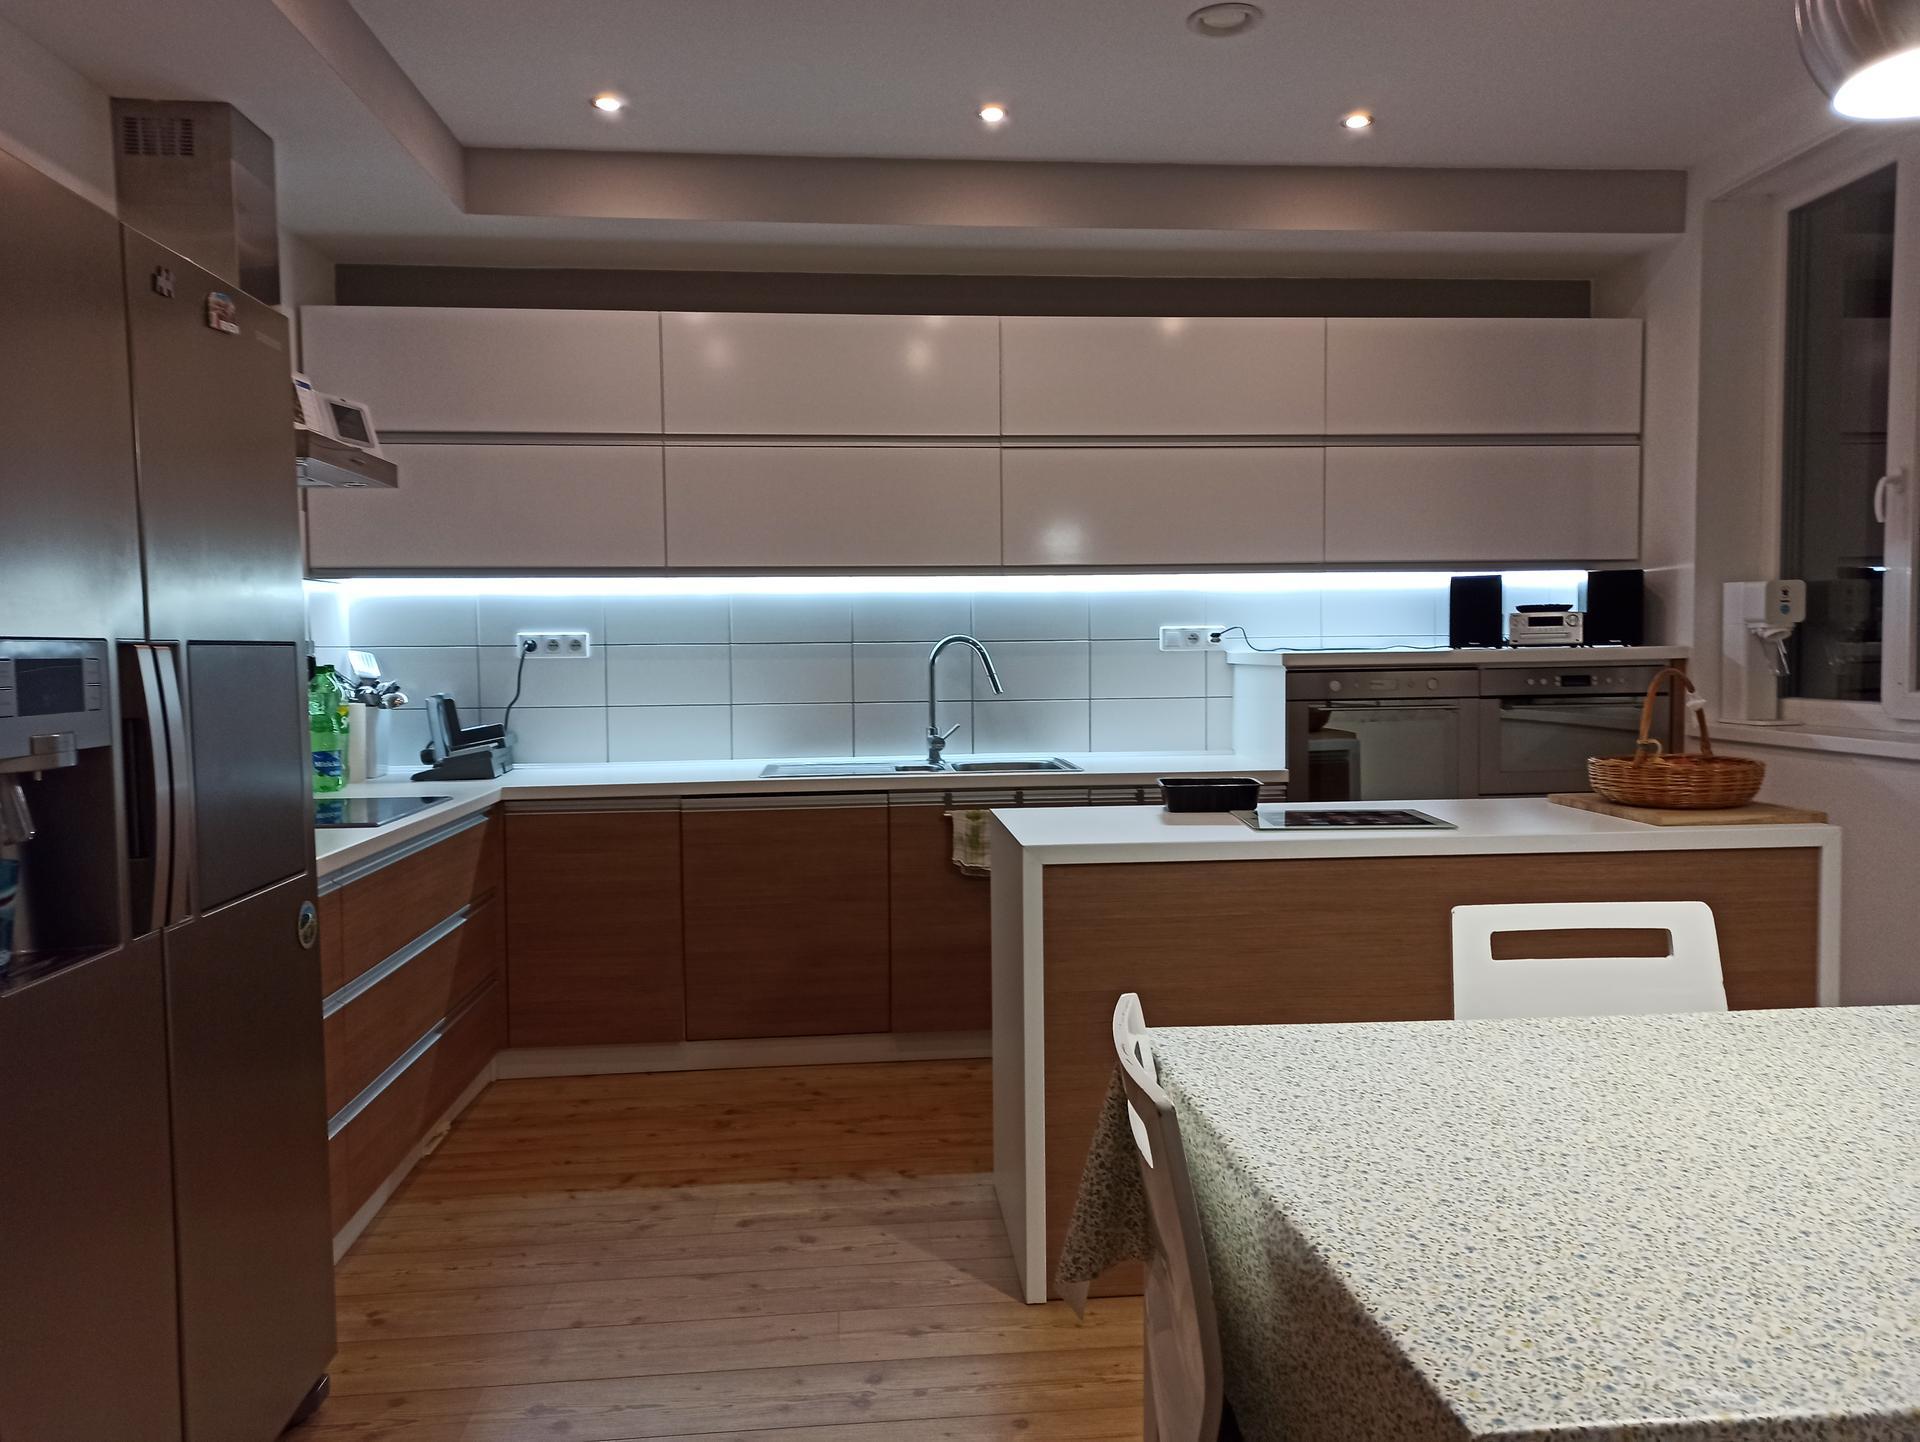 Kuchyna - upgrade